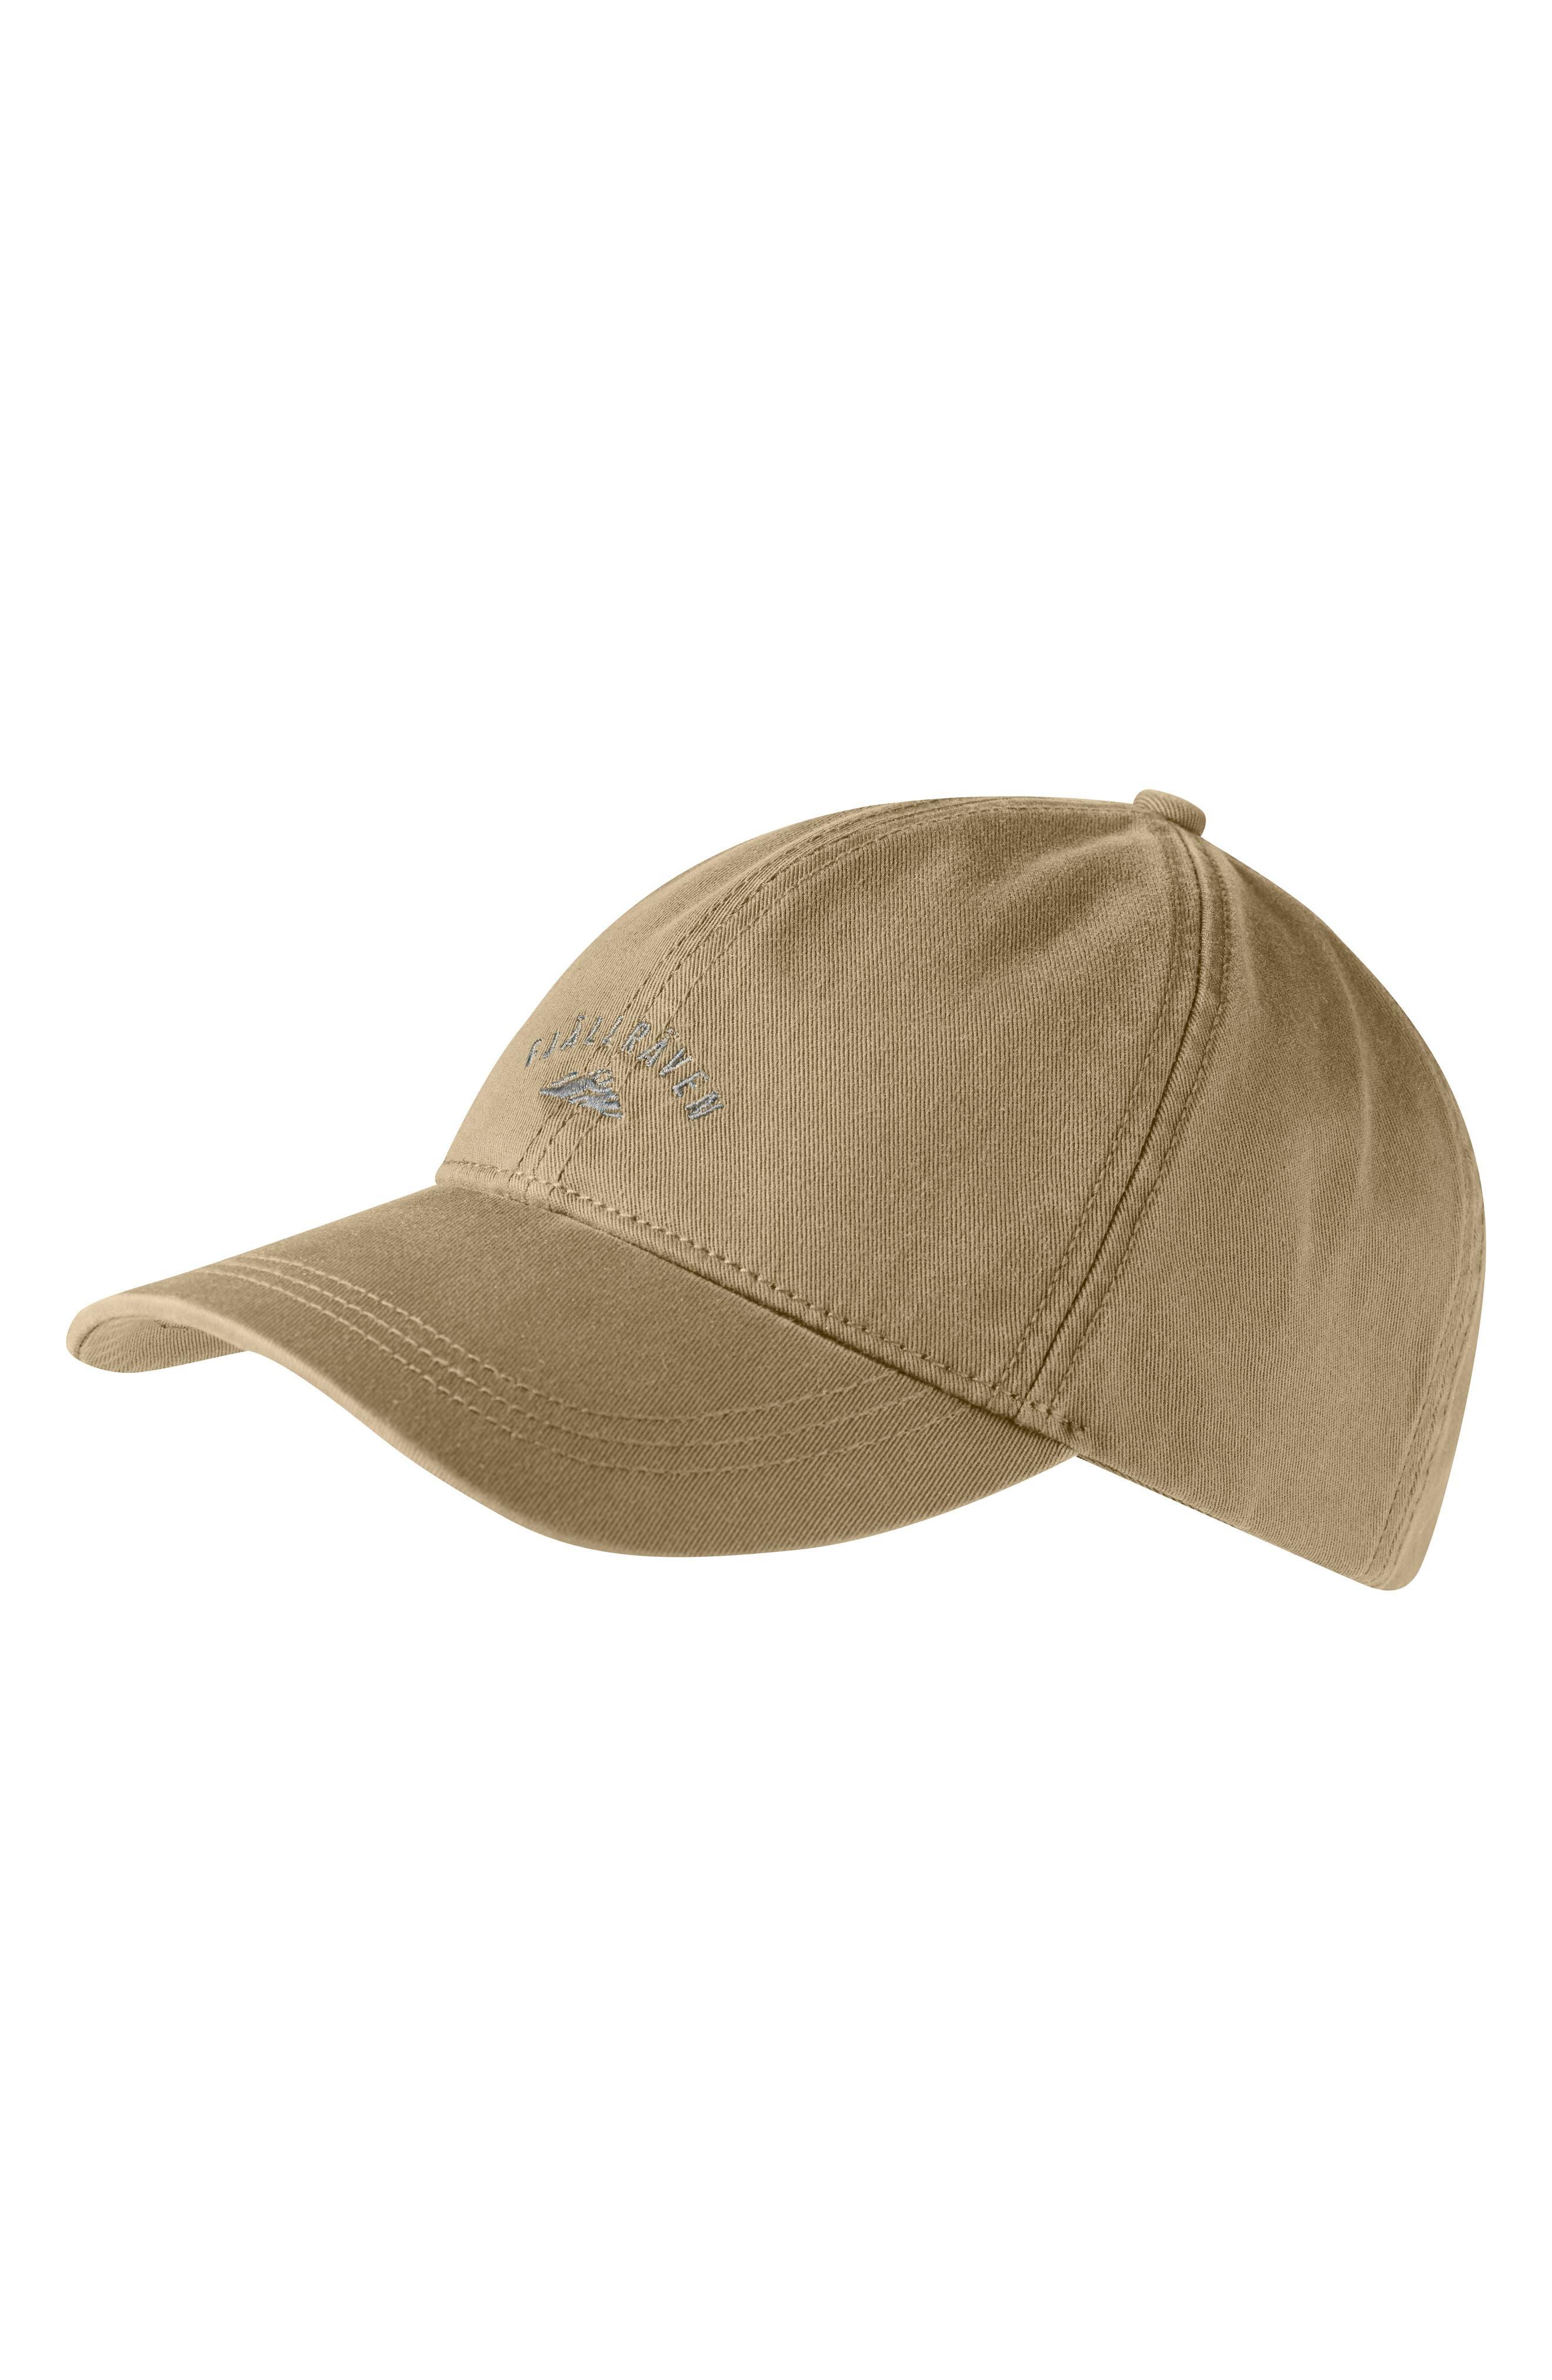 Vik Baseball Cap,                         Main,                         color, SAND